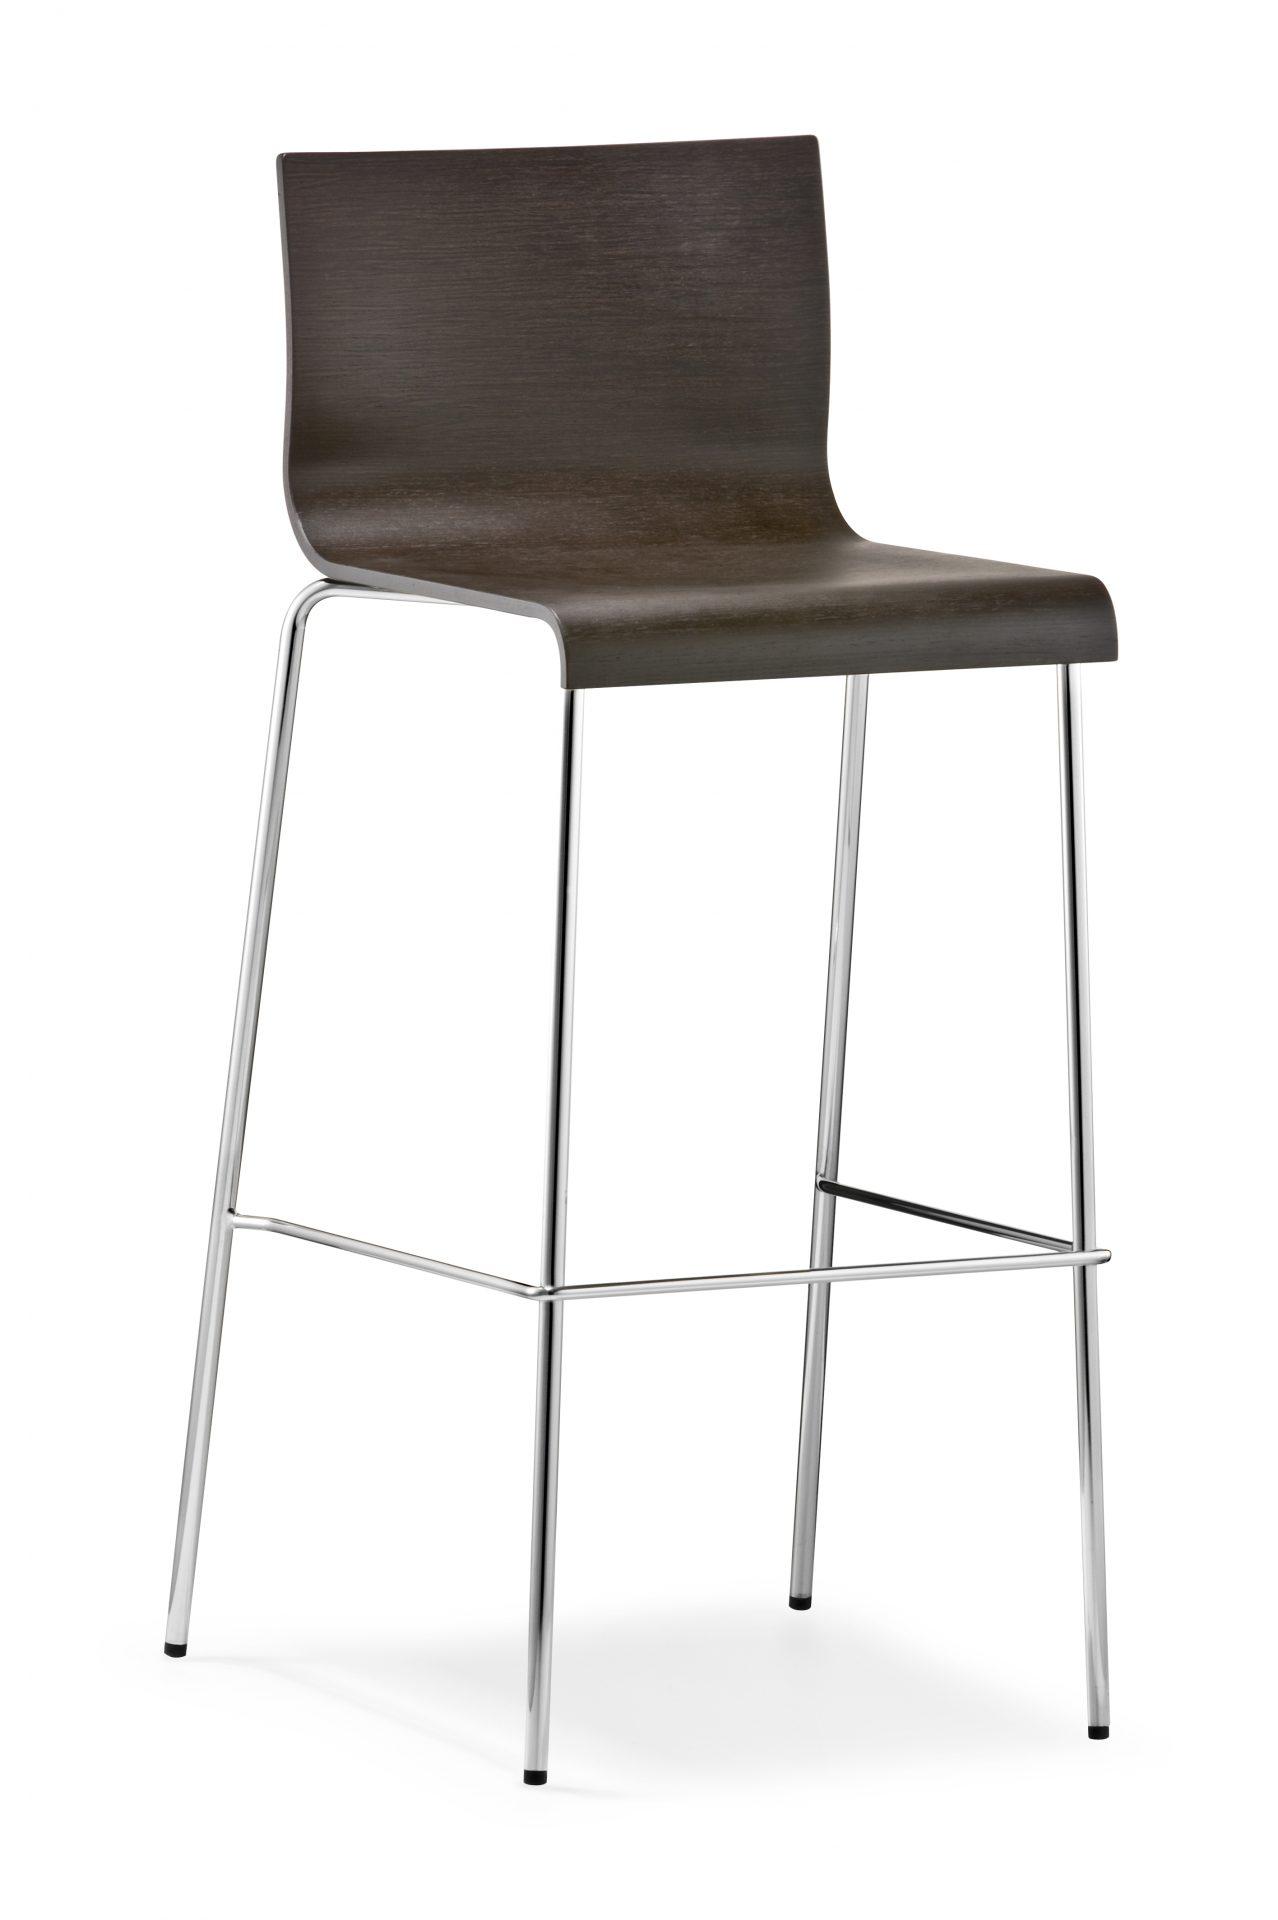 Kuadra højstol 1336